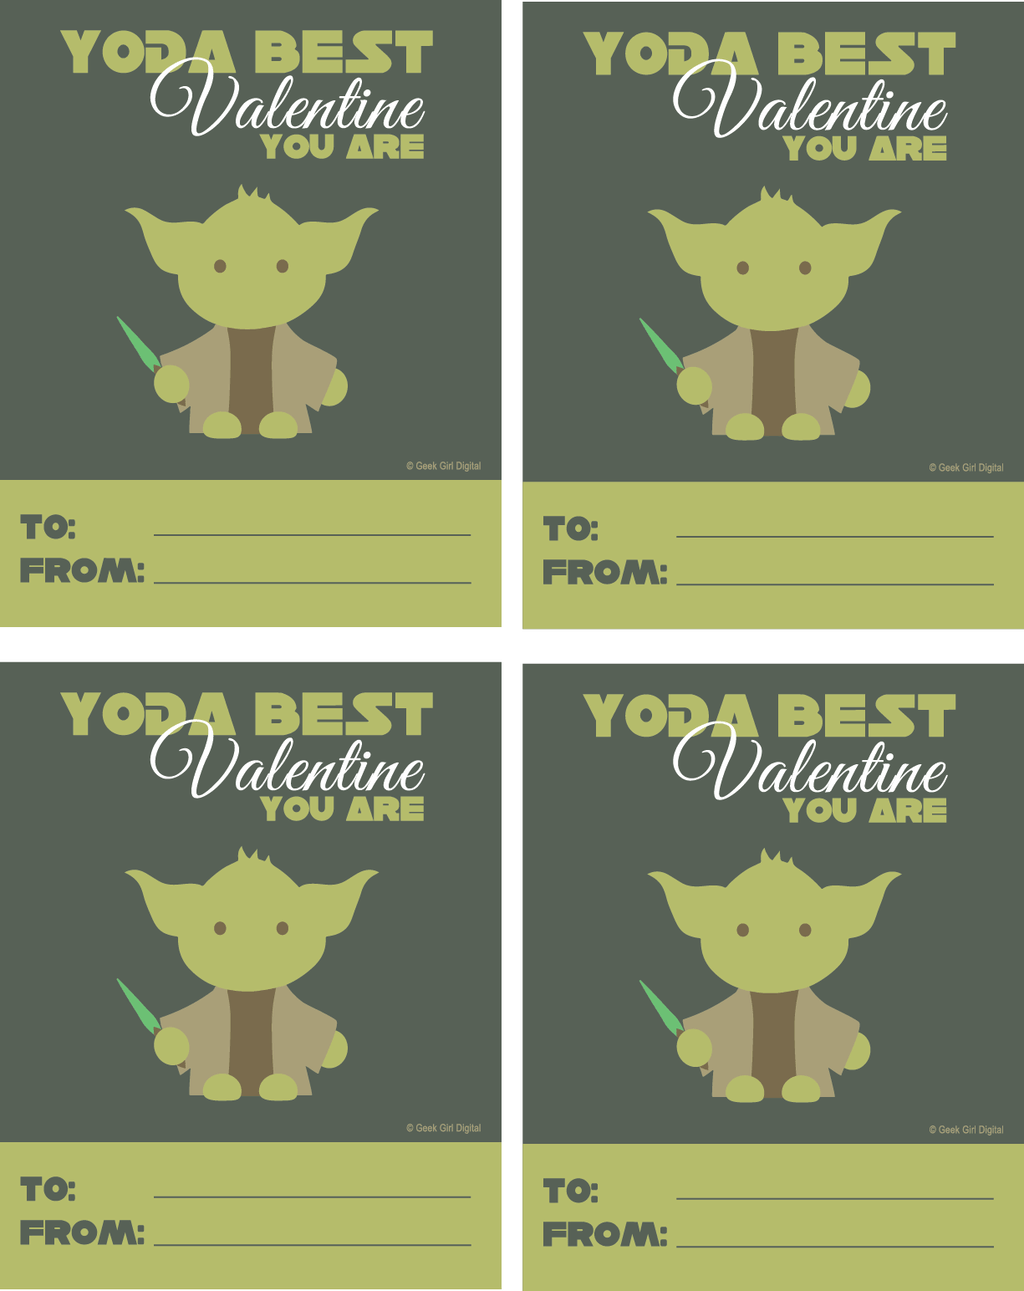 photo about Yoda Printable identify No cost Yoda Valentine Printable Whisky + Solar